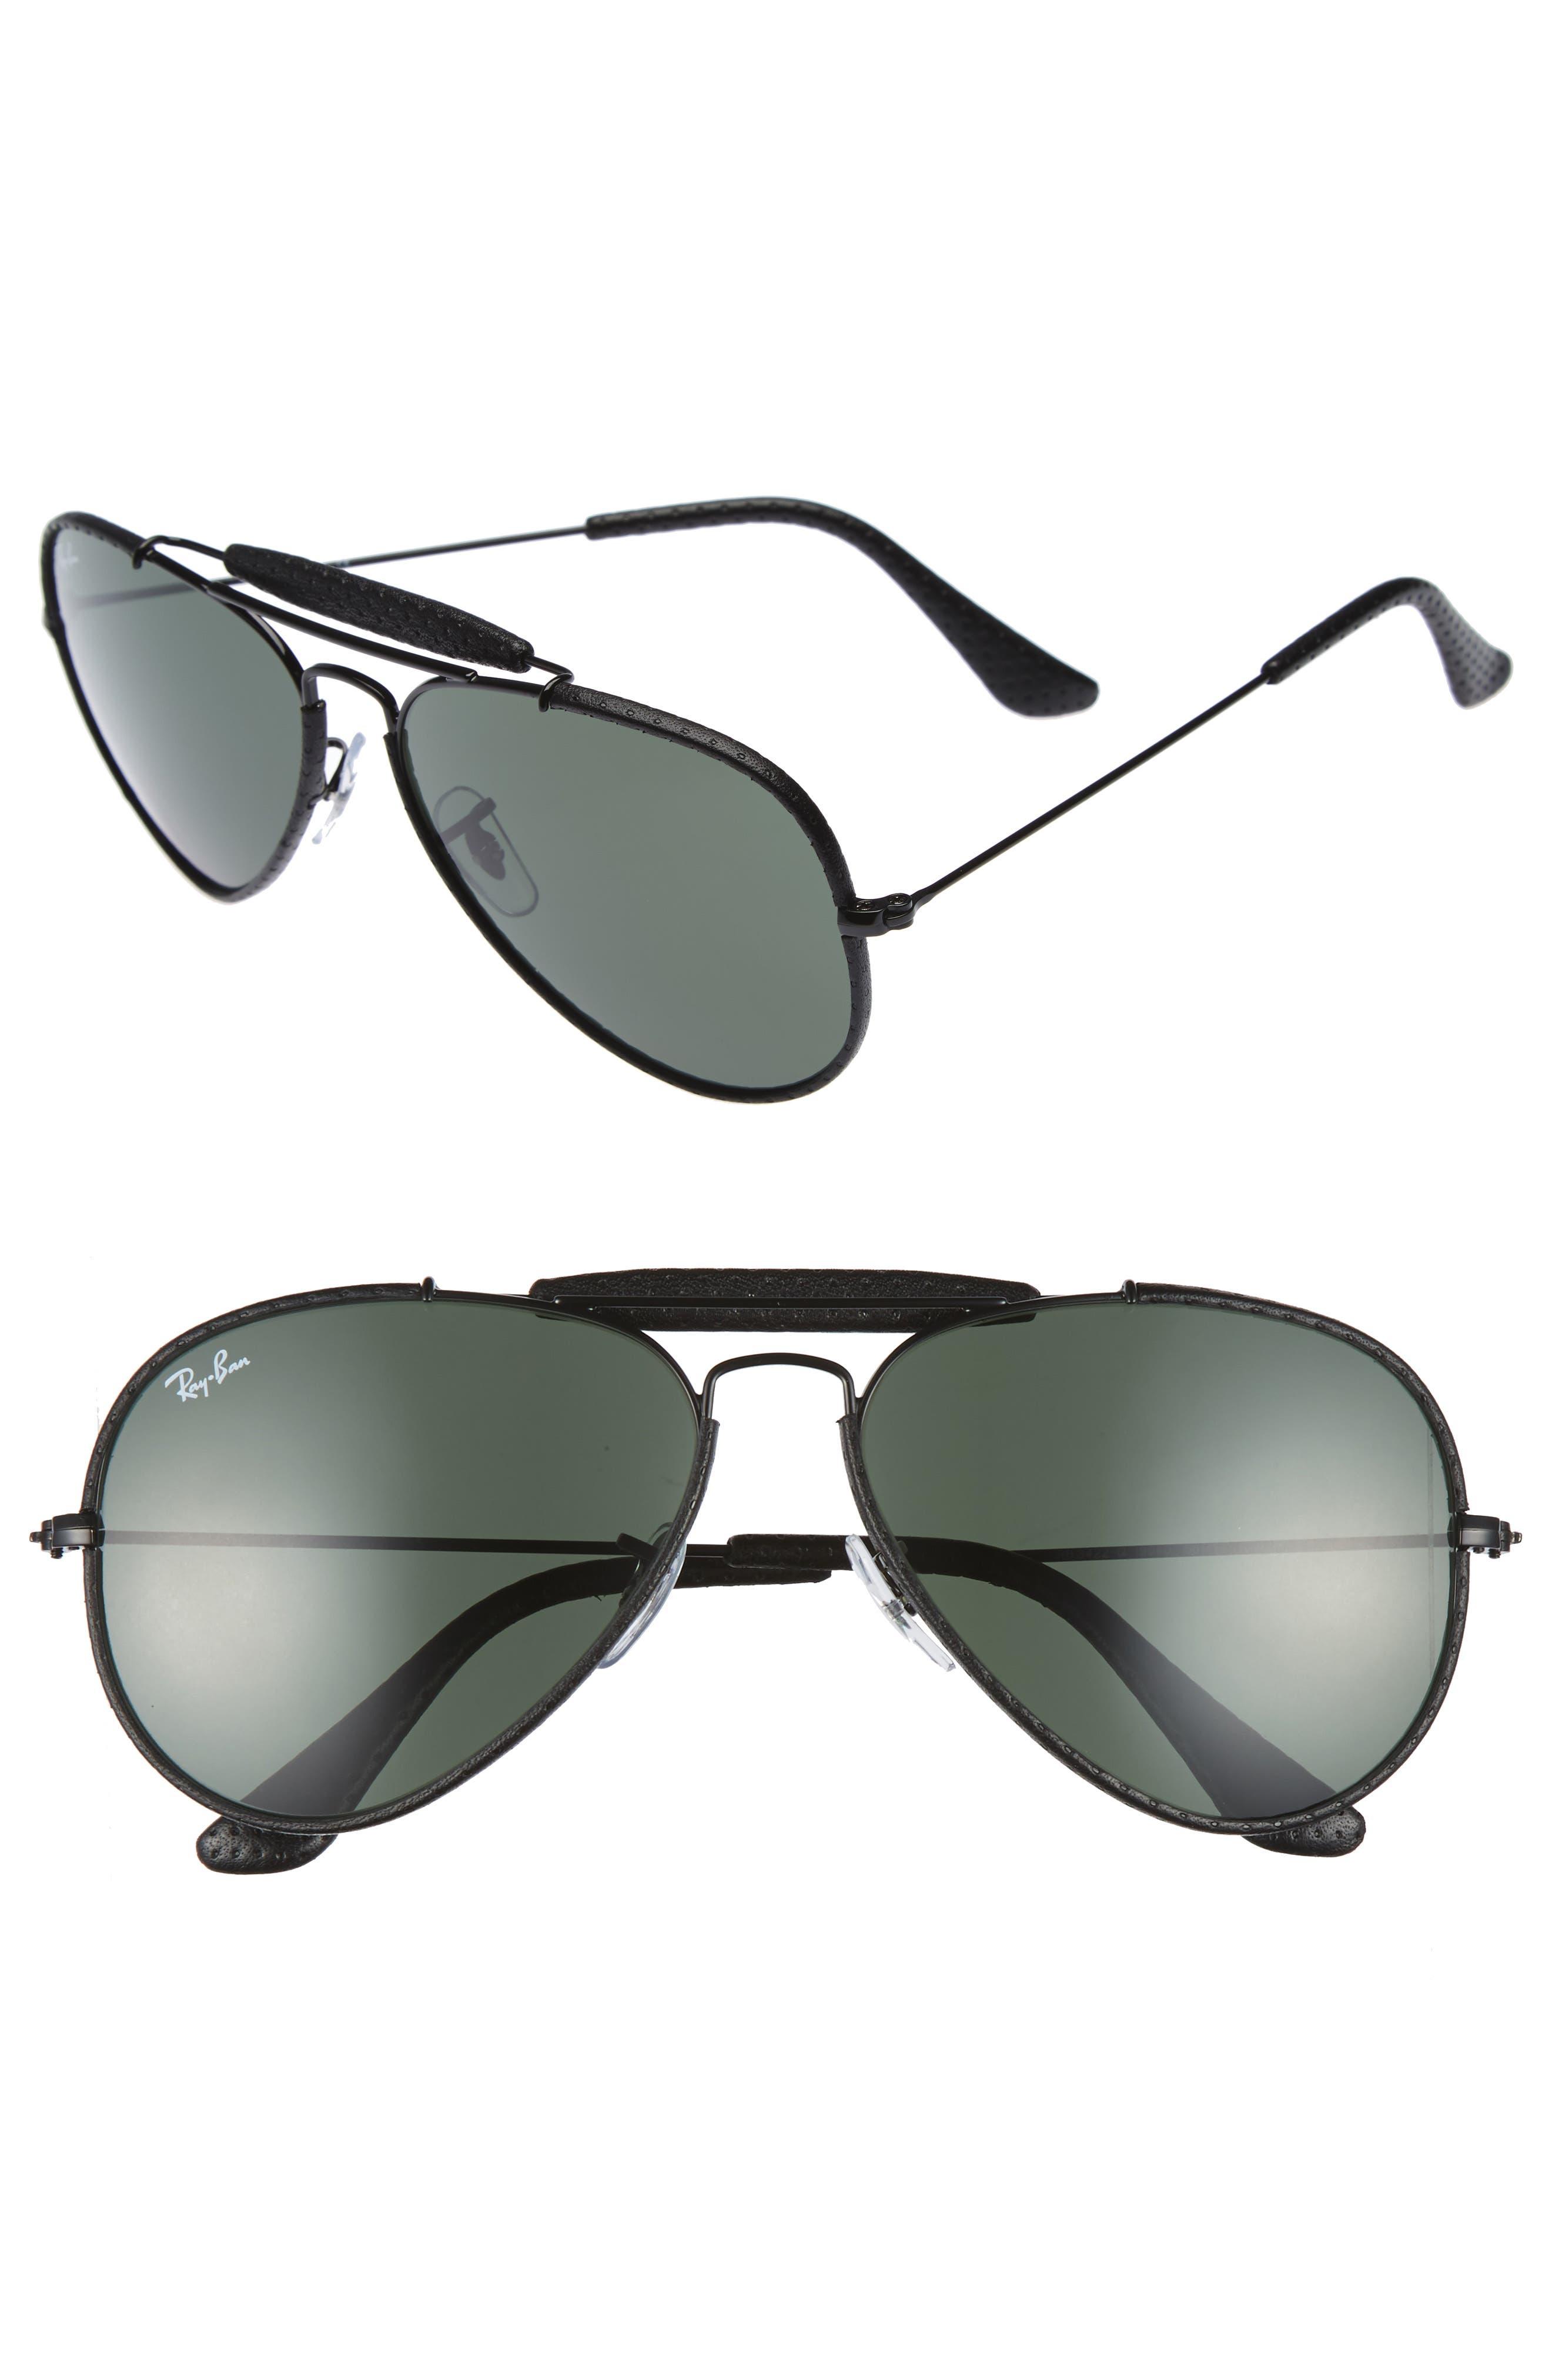 Alternate Image 1 Selected - Ray-Ban Outdoorsman 58mm Aviator Sunglasses